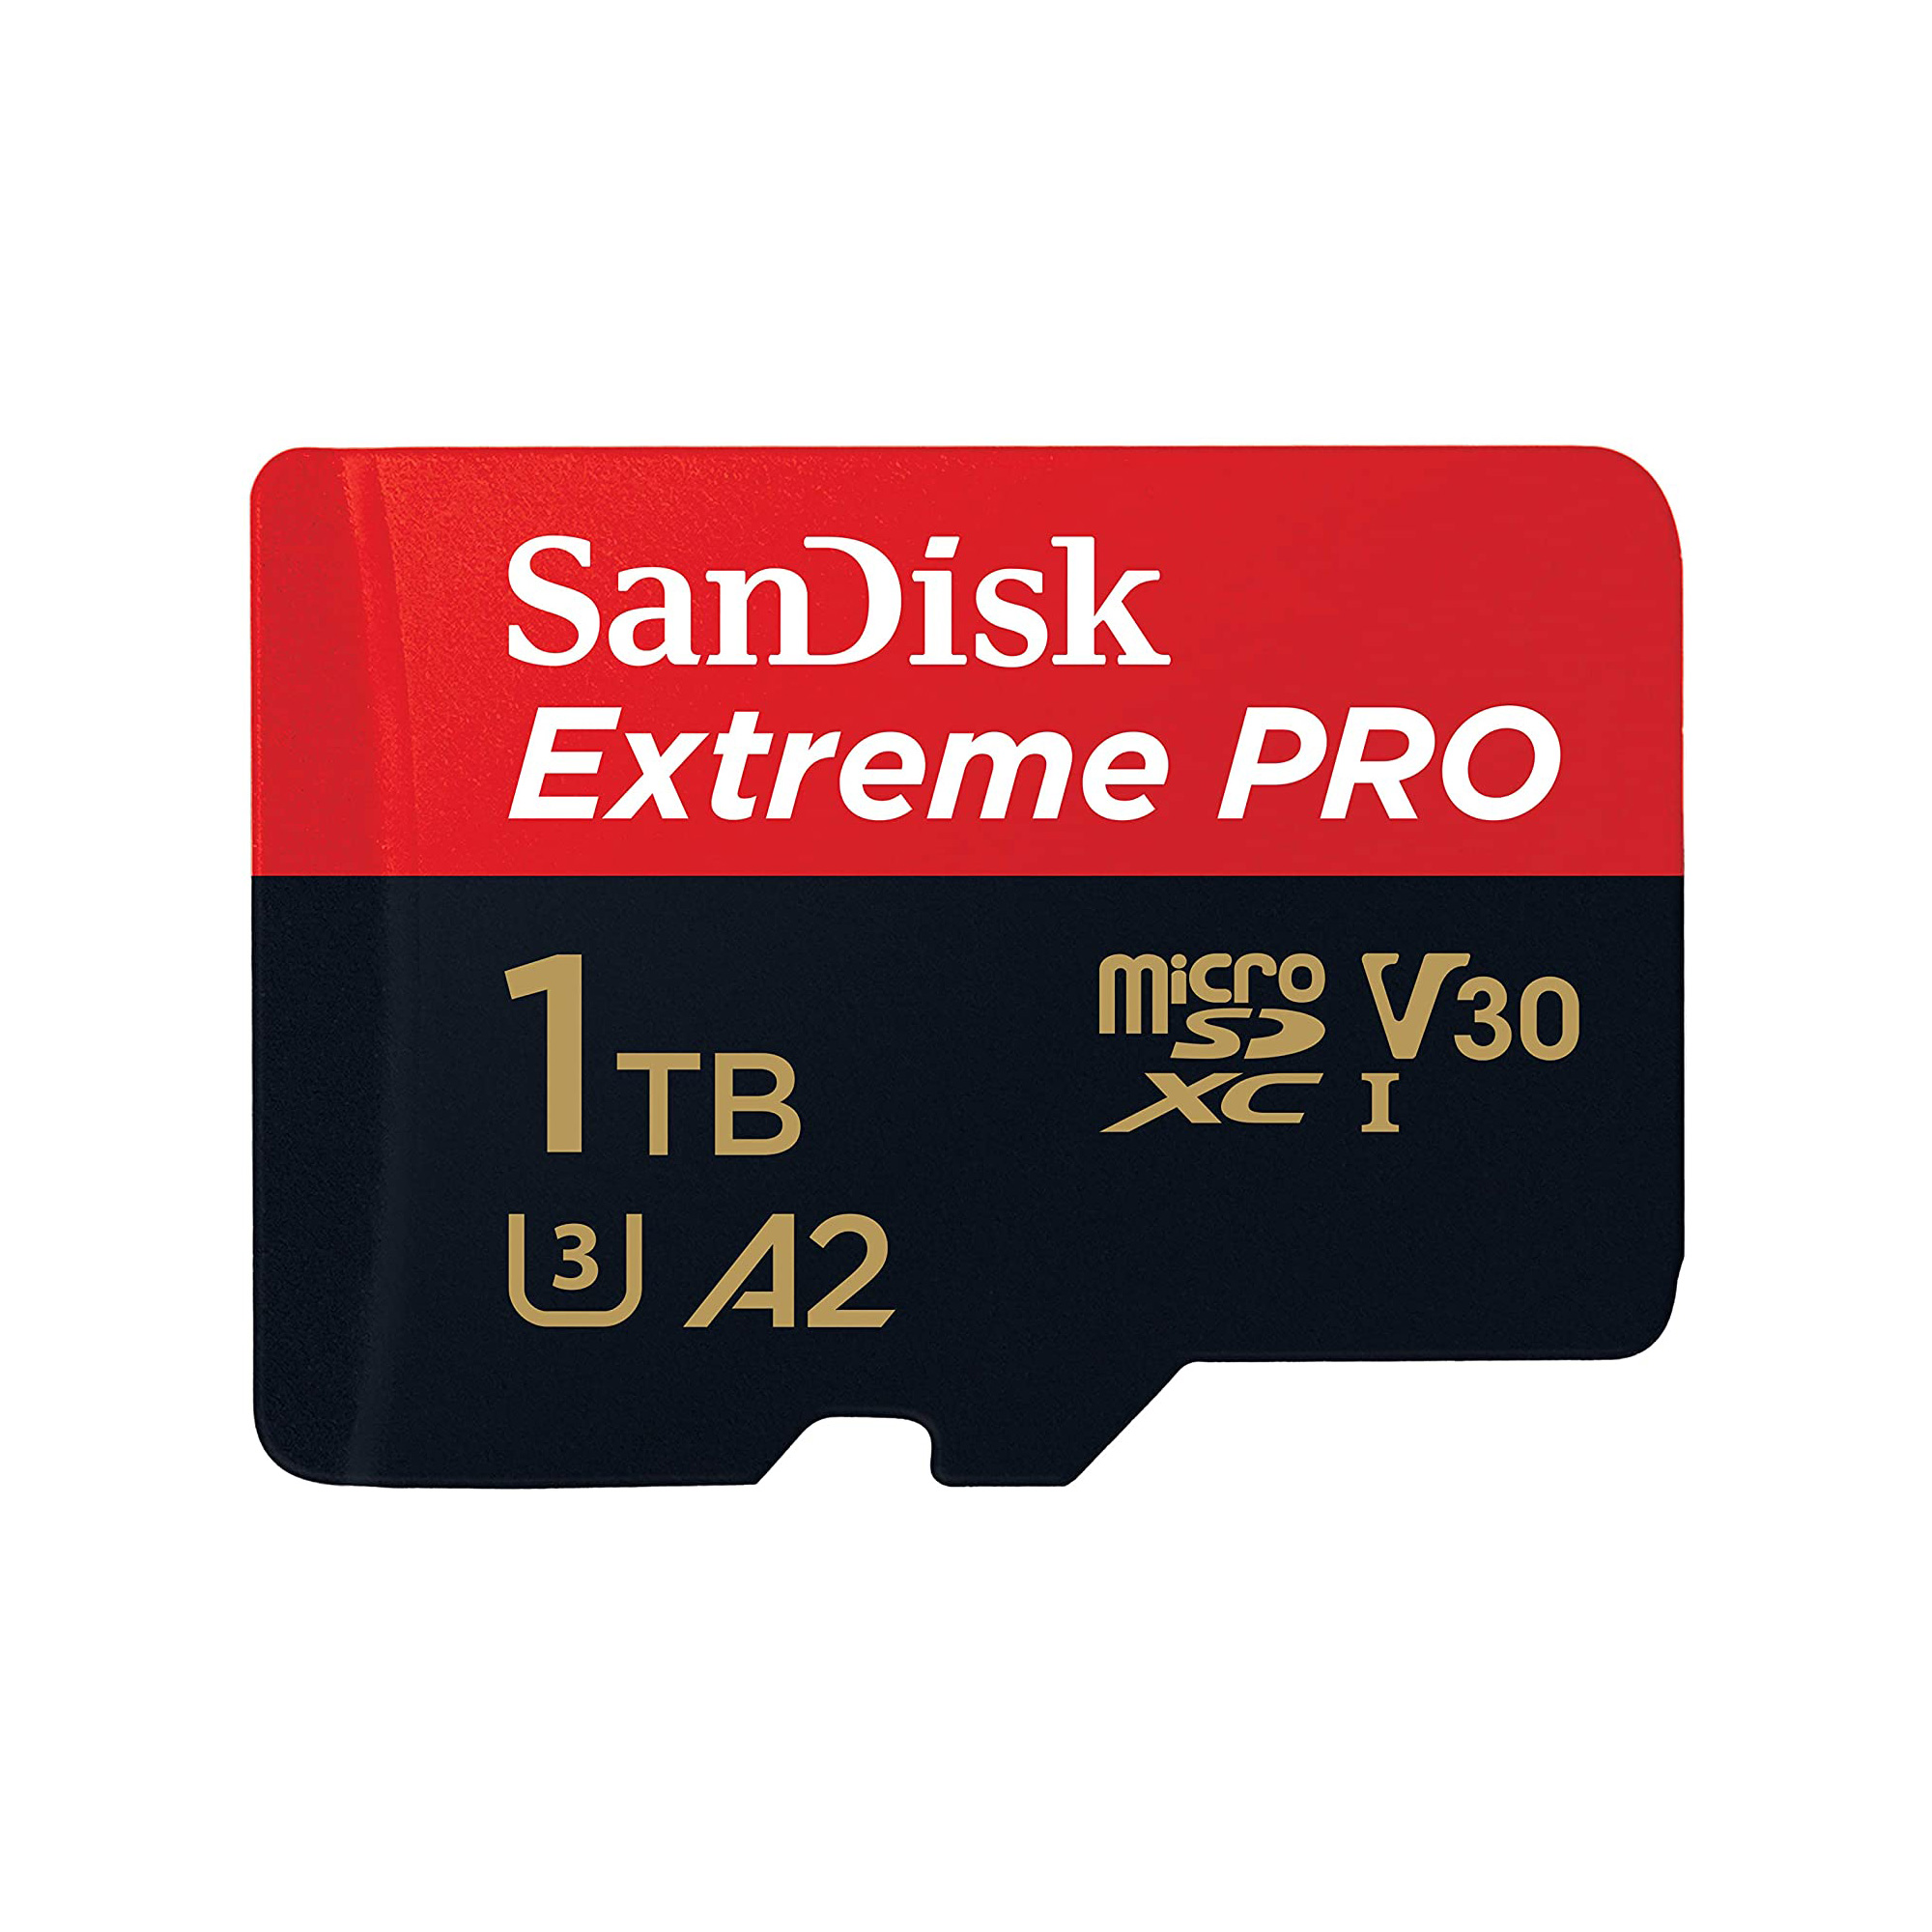 SanDisk Extreme Pro 1TB MicroSDXC